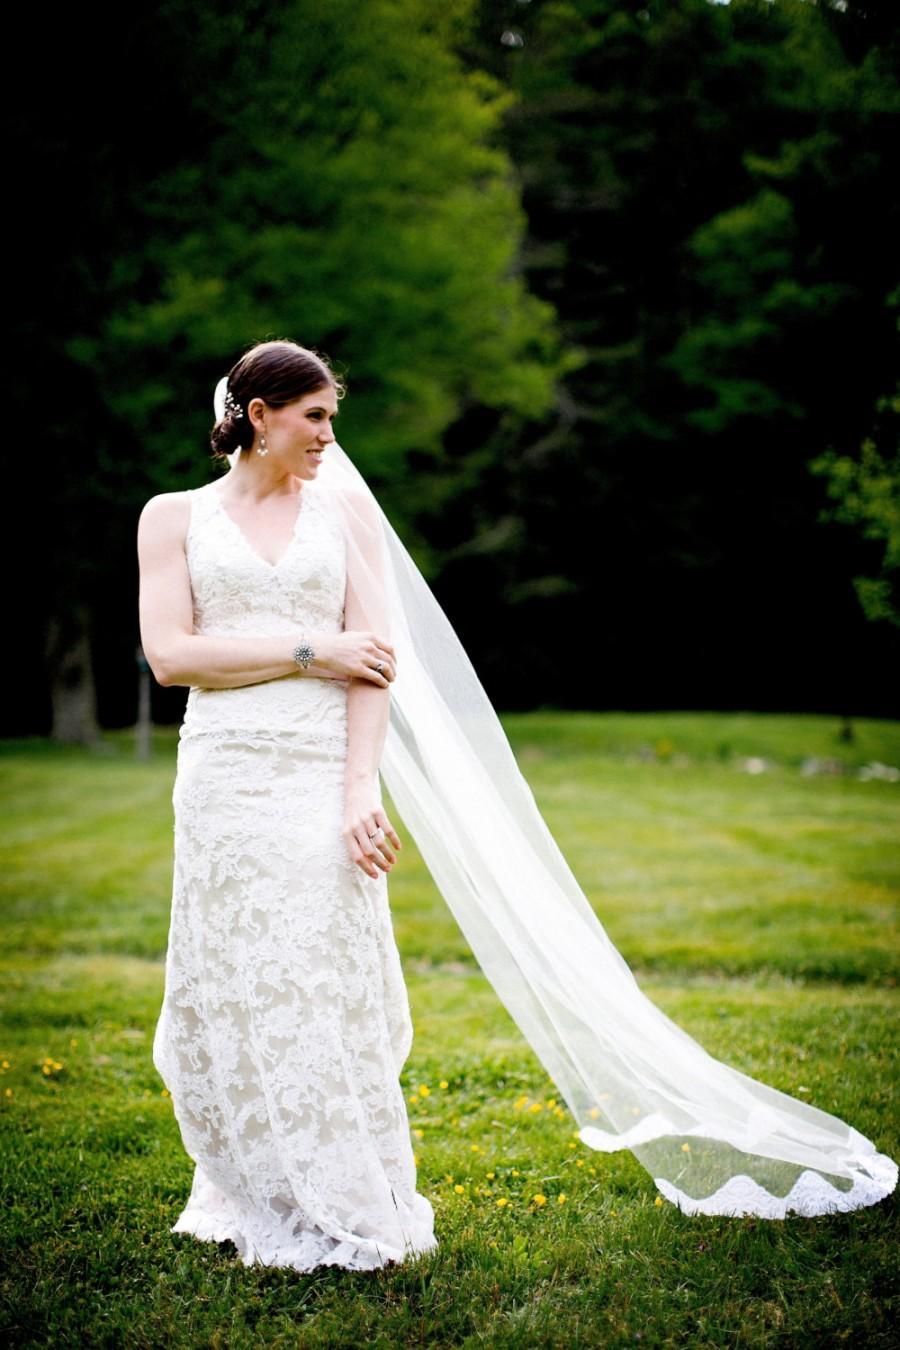 Свадьба - Wedding Veil, Lace Bridal Veil, Long Tulle Veil, Lace Chapel Length Veil, Lace Cathedral Veil